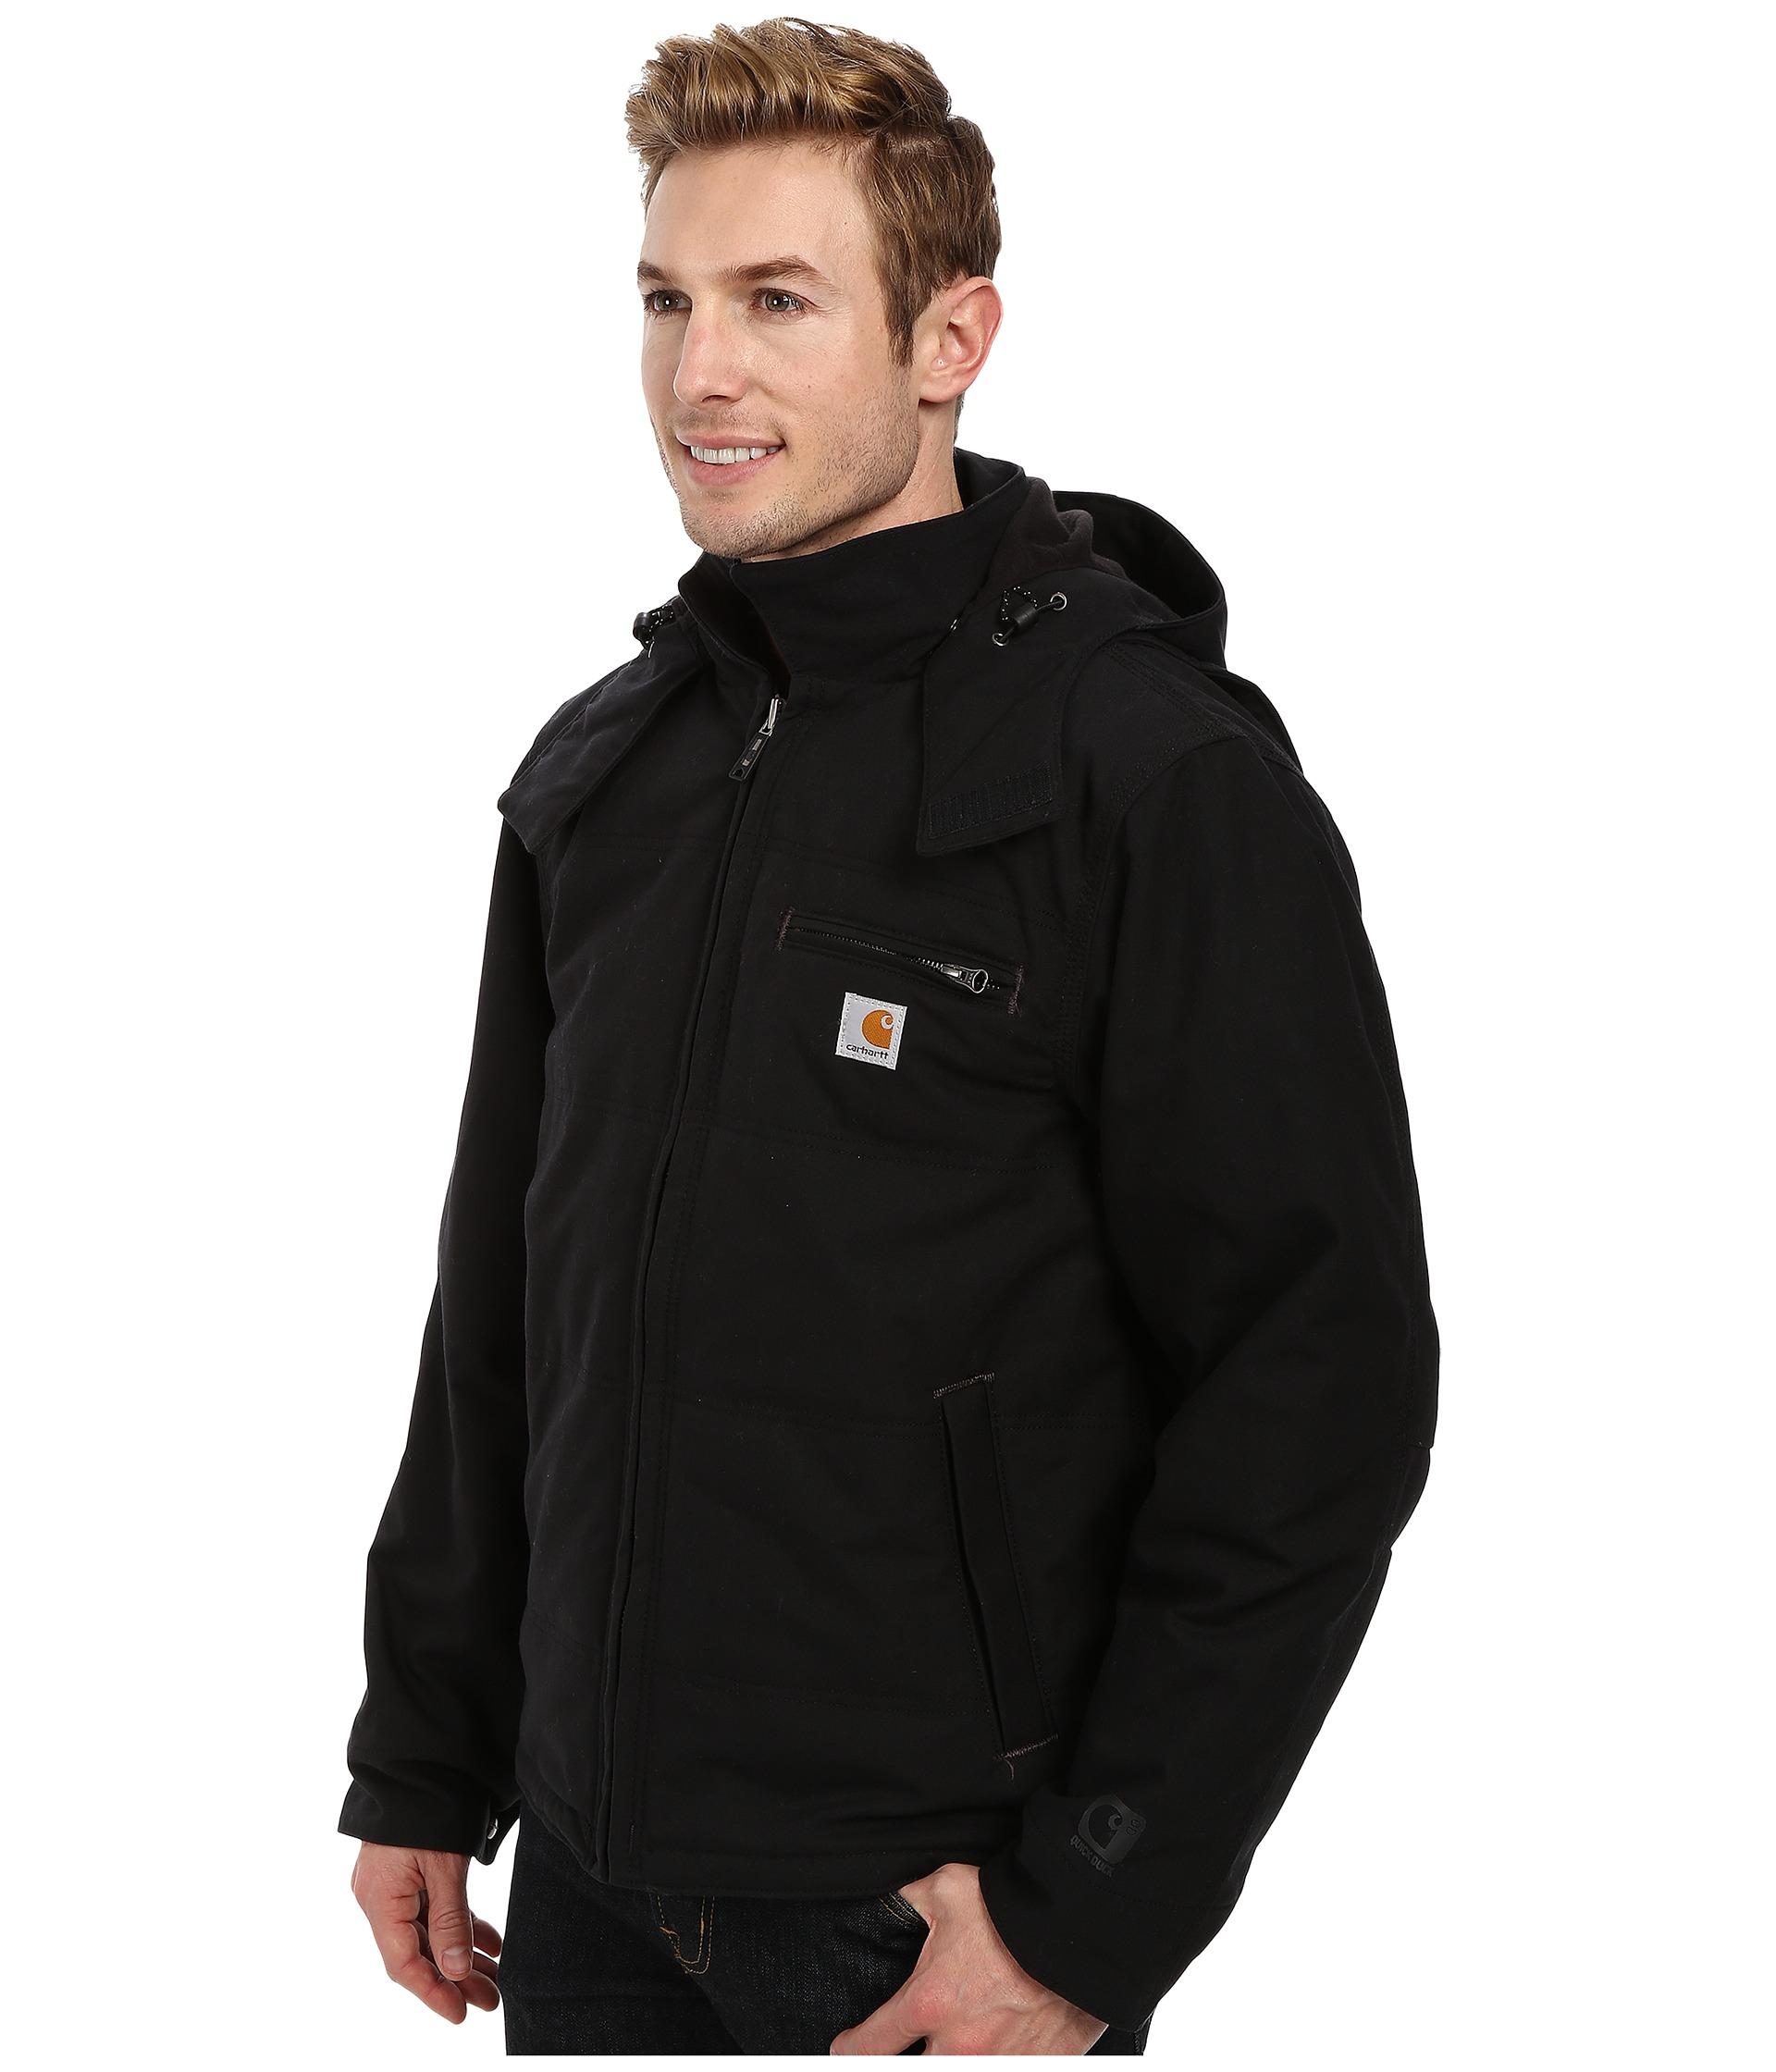 Carhartt big tall quick duck livingston jacket in black for Carhartt work shirts tall